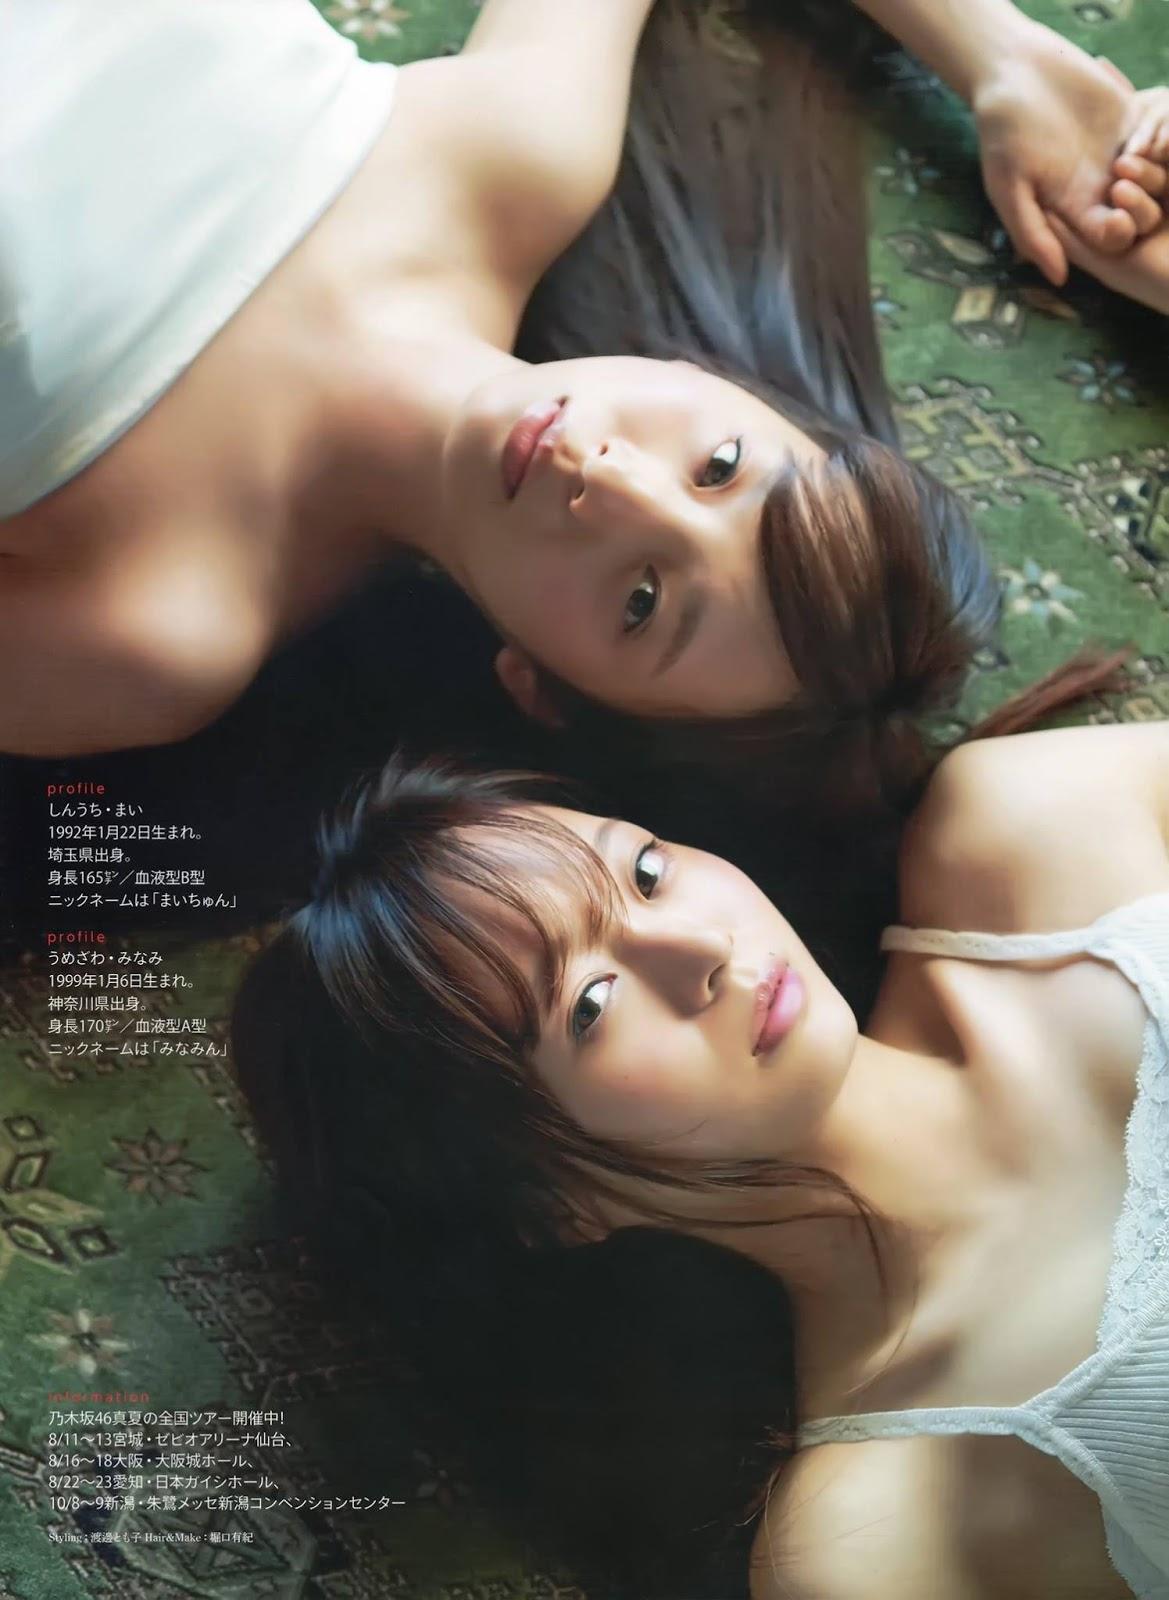 Shinuchi Mai 新内眞衣, Umezawa Minami 梅澤美波, ENTAME 2017.09 (月刊エンタメ 2017年9月号)